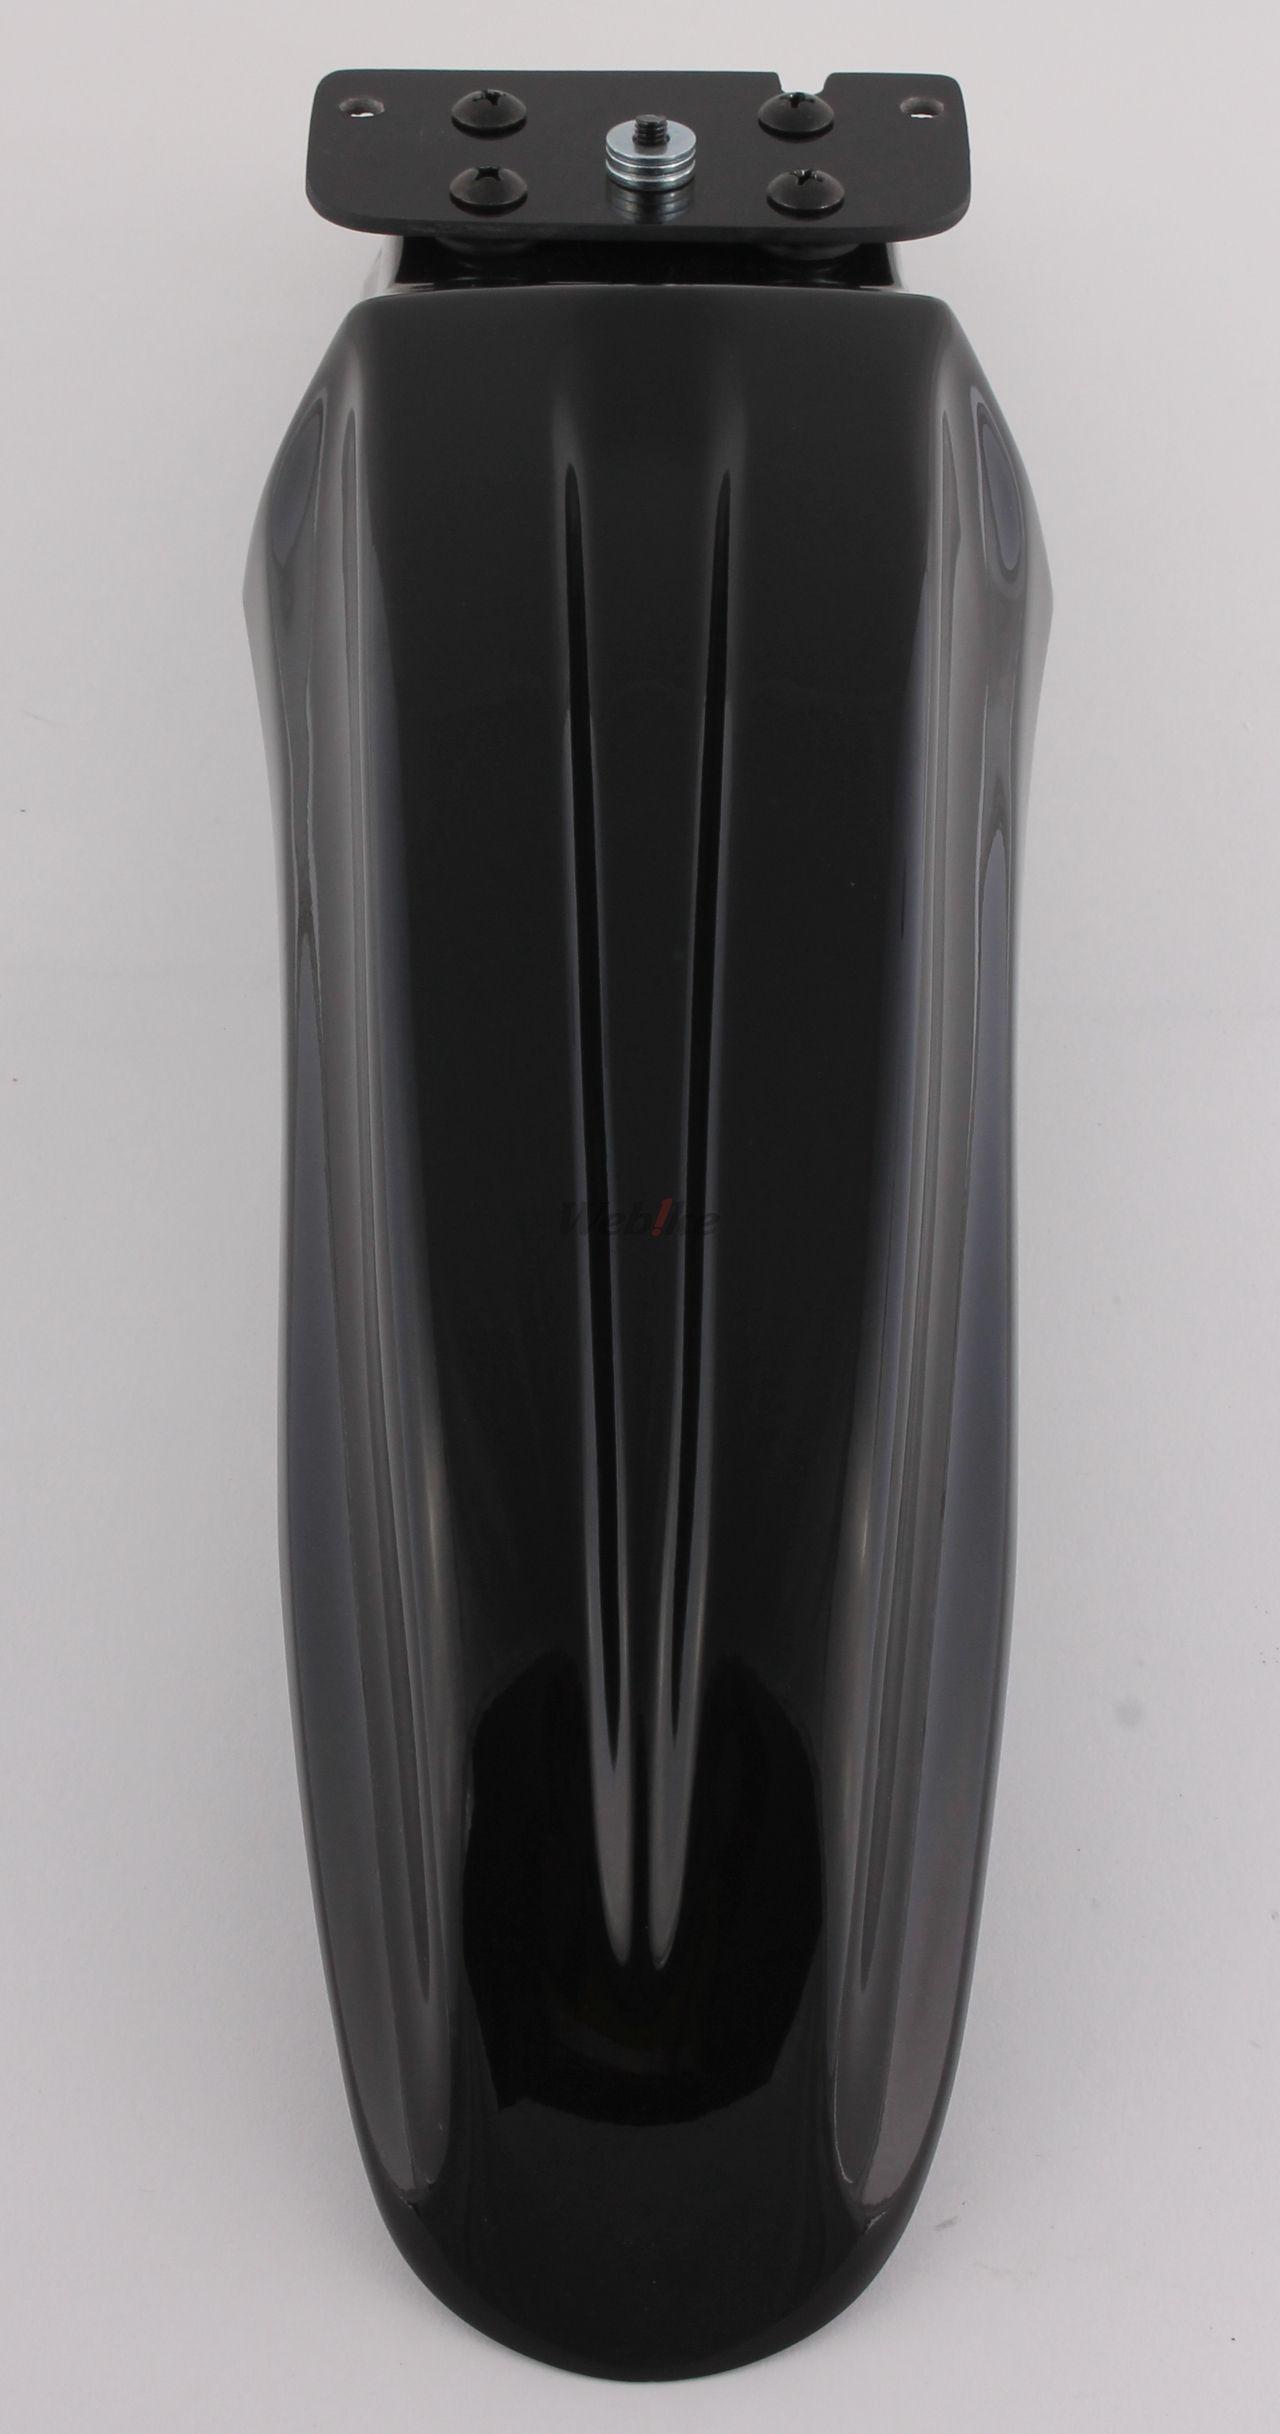 【OSCAR】Up Type 前土除 (黒色塑膠) - 「Webike-摩托百貨」